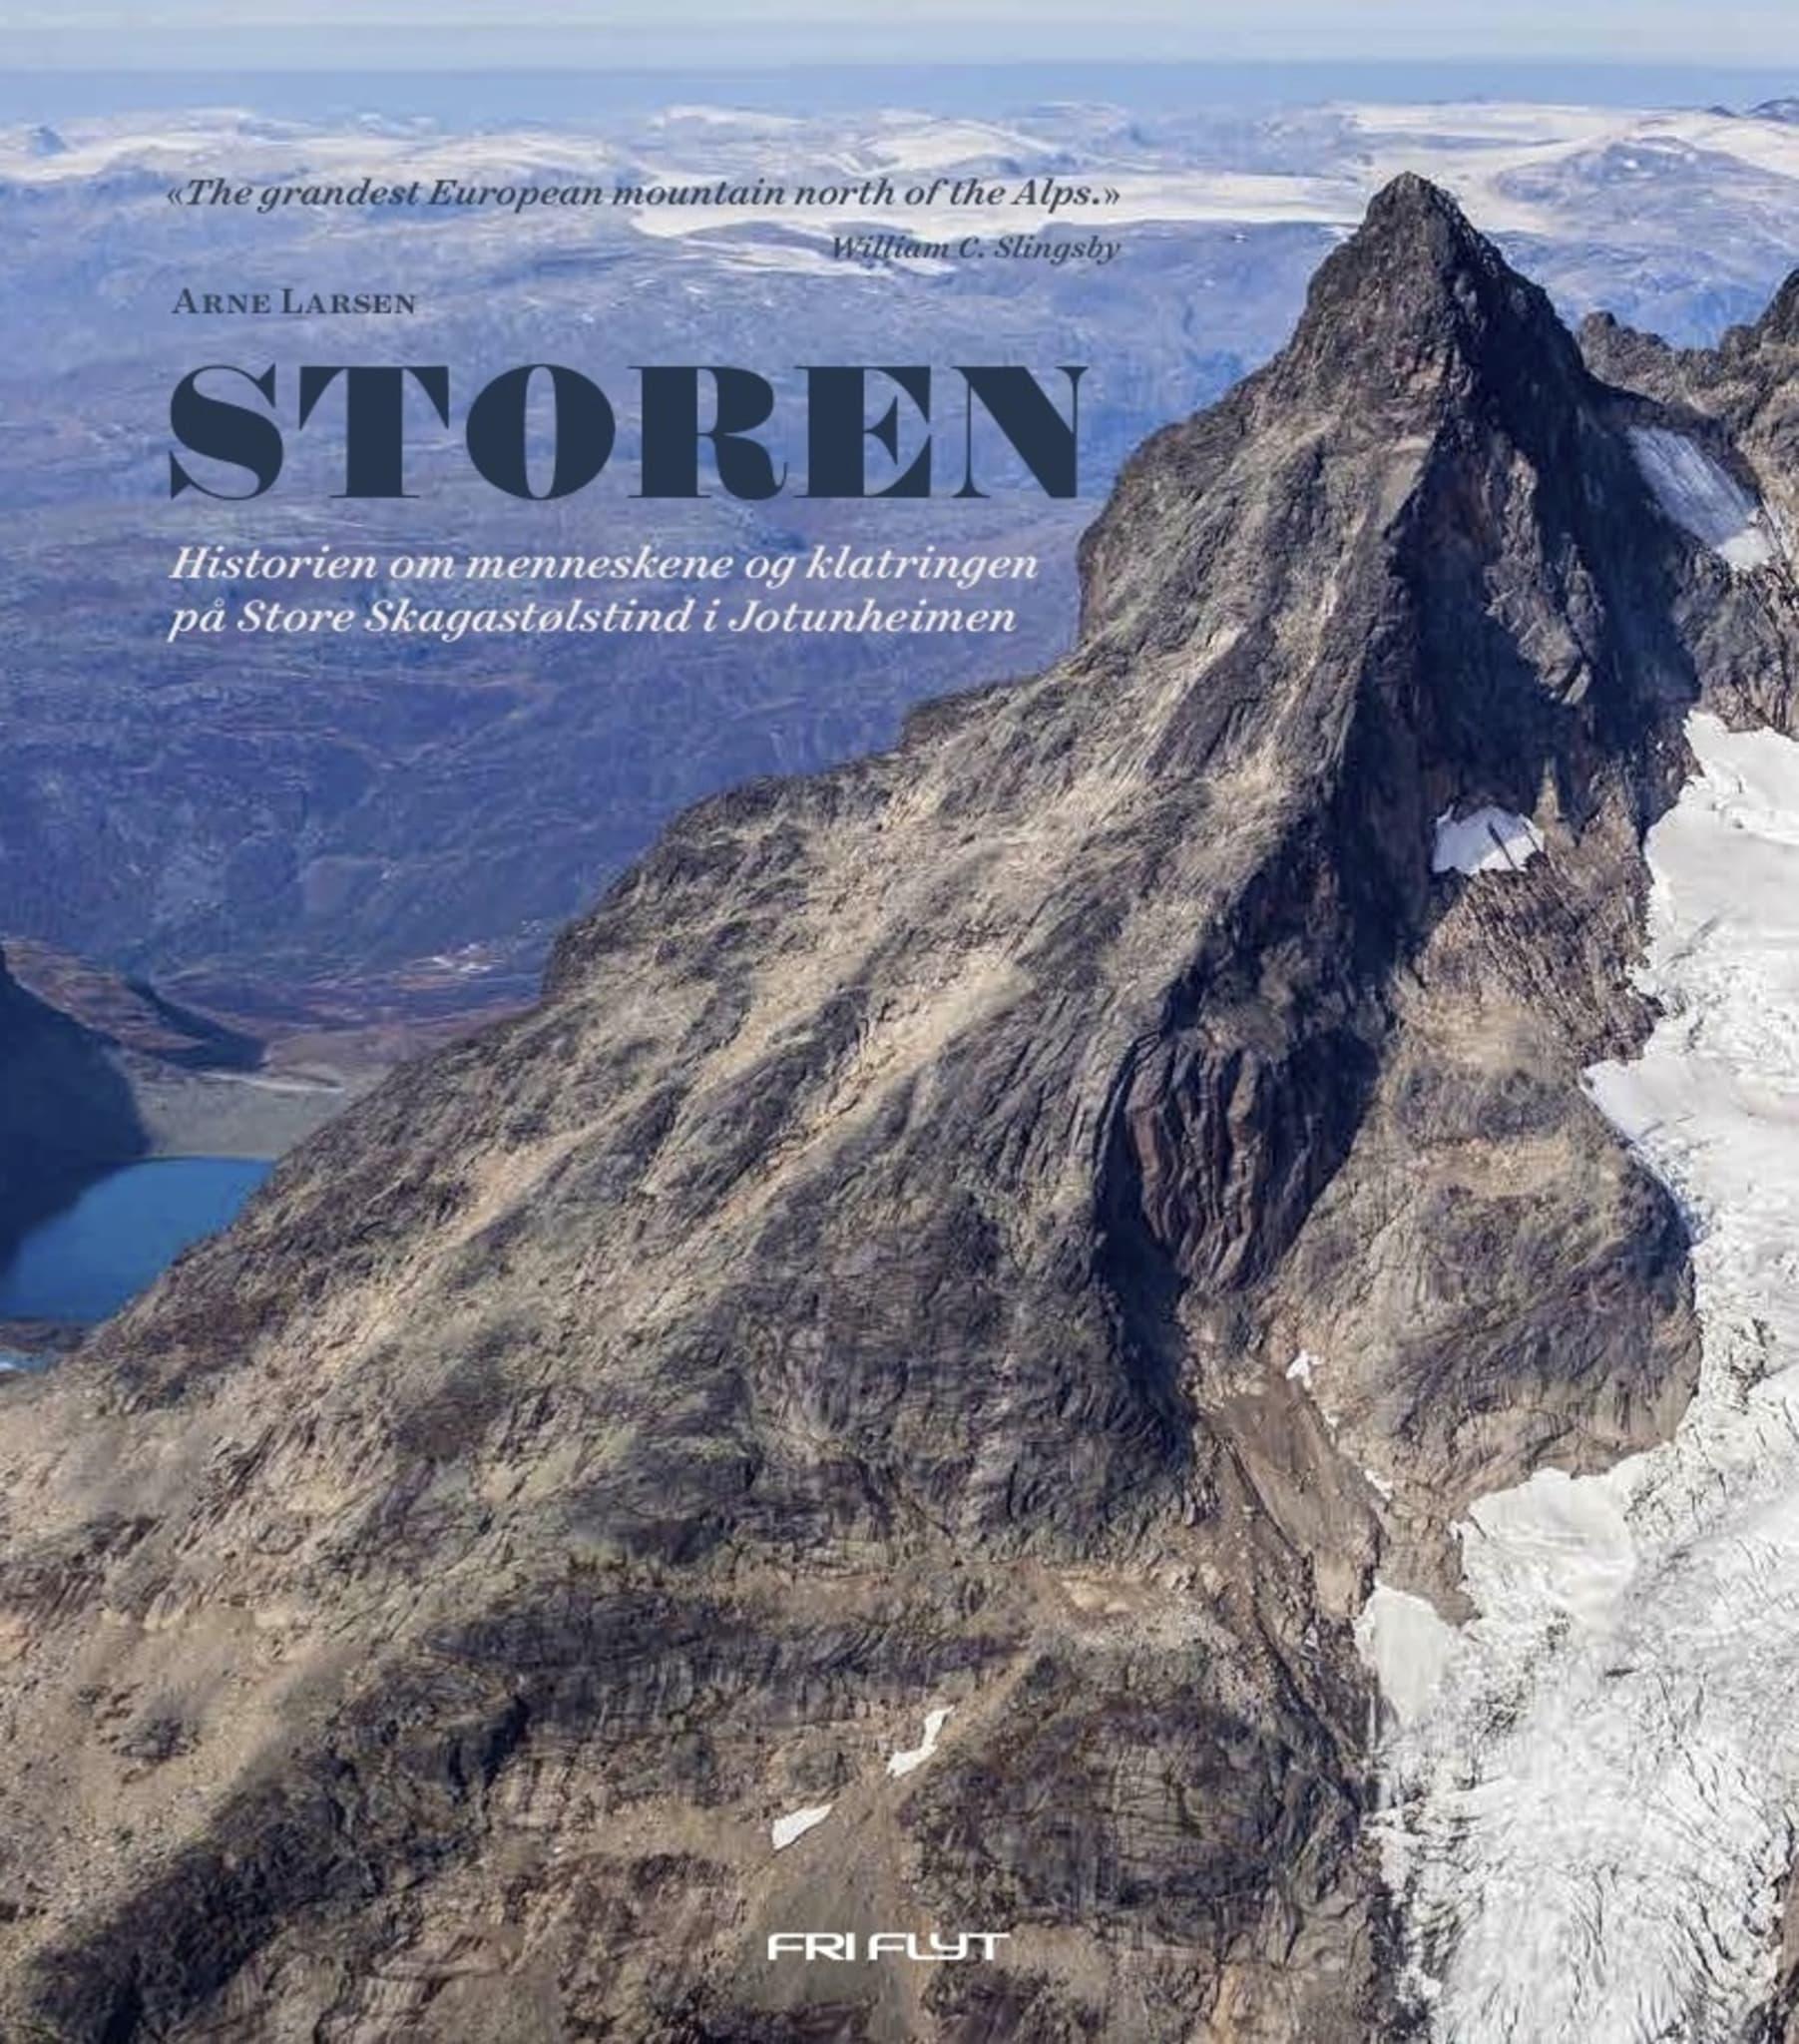 Hele historien om klatringen på Store Skagastølstind.